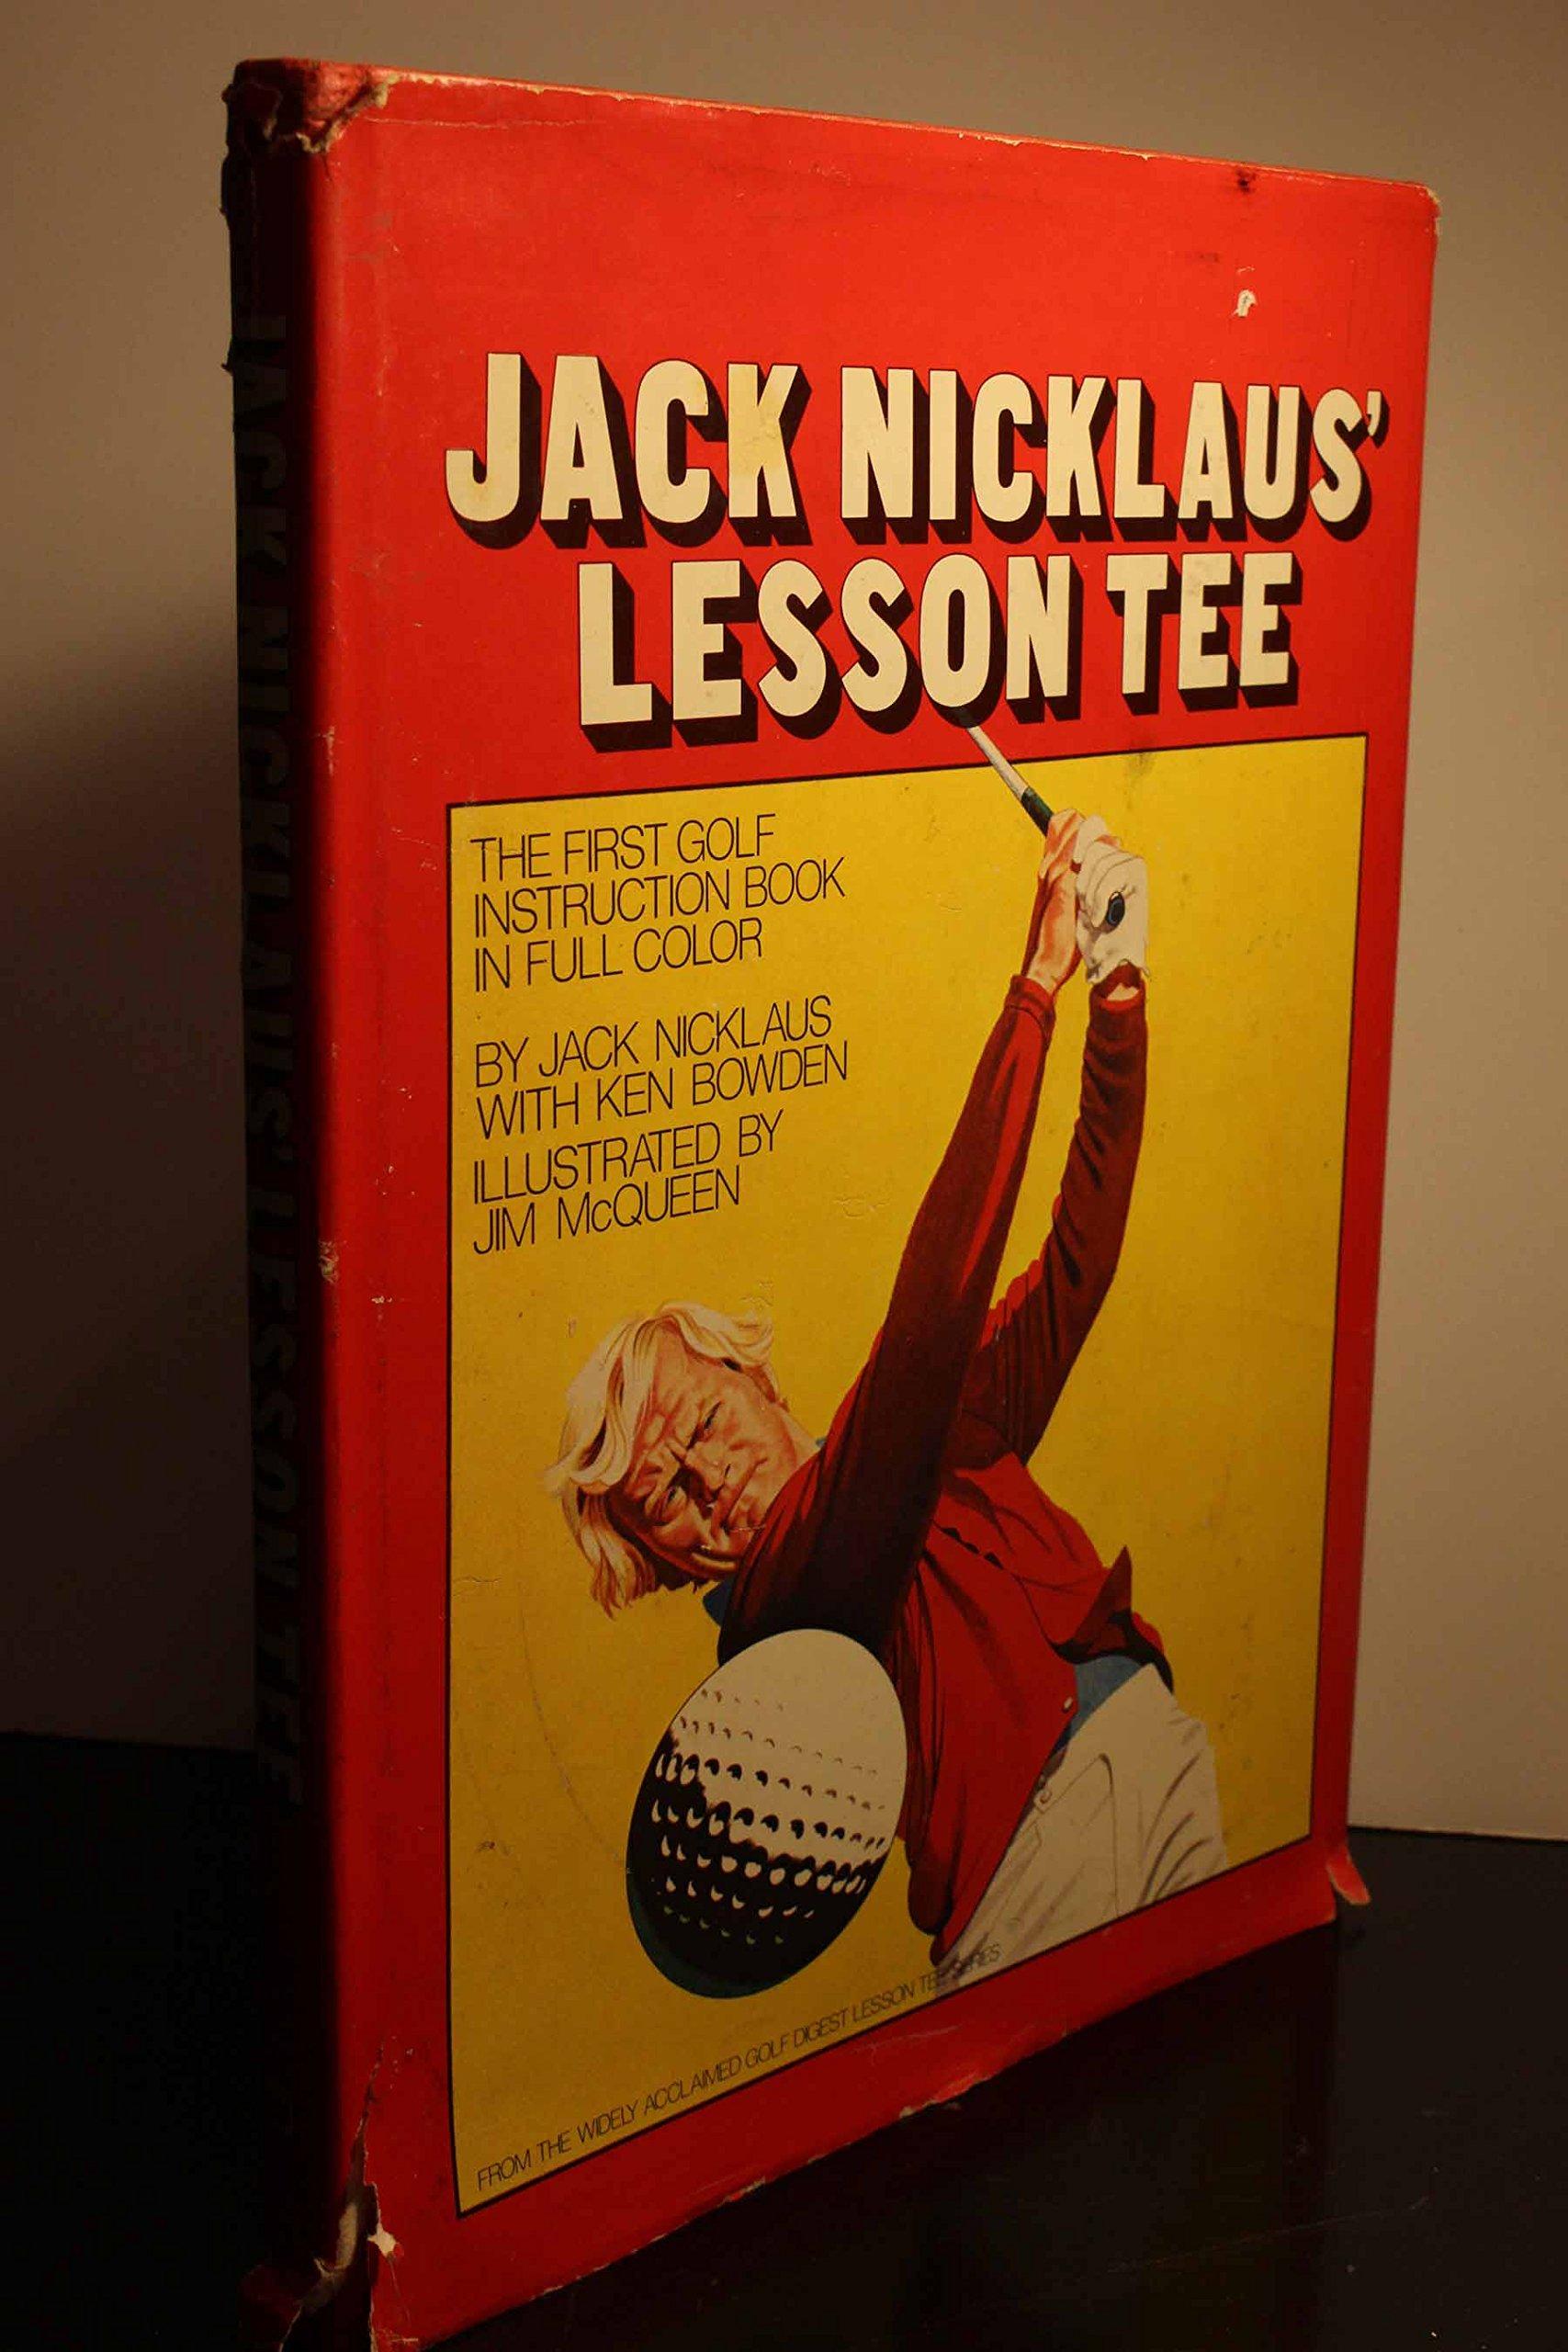 jack nicklaus lesson tee jack nicklaus 9780914178118 amazoncom books